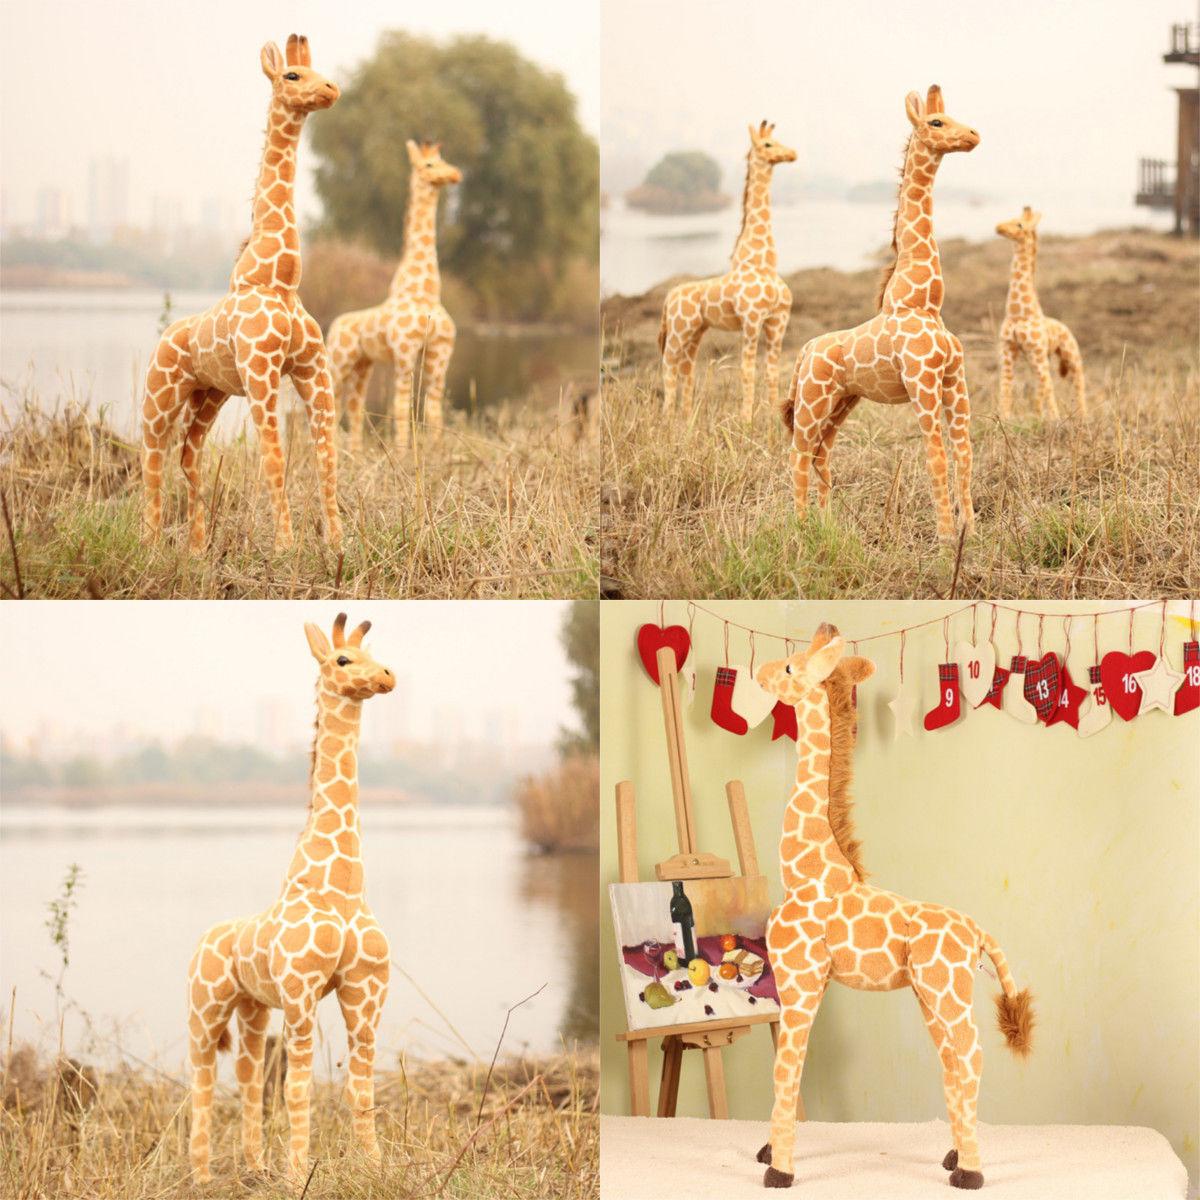 New Plush Giraffe Toy Doll Giant Large Stuffed Animals Soft Doll